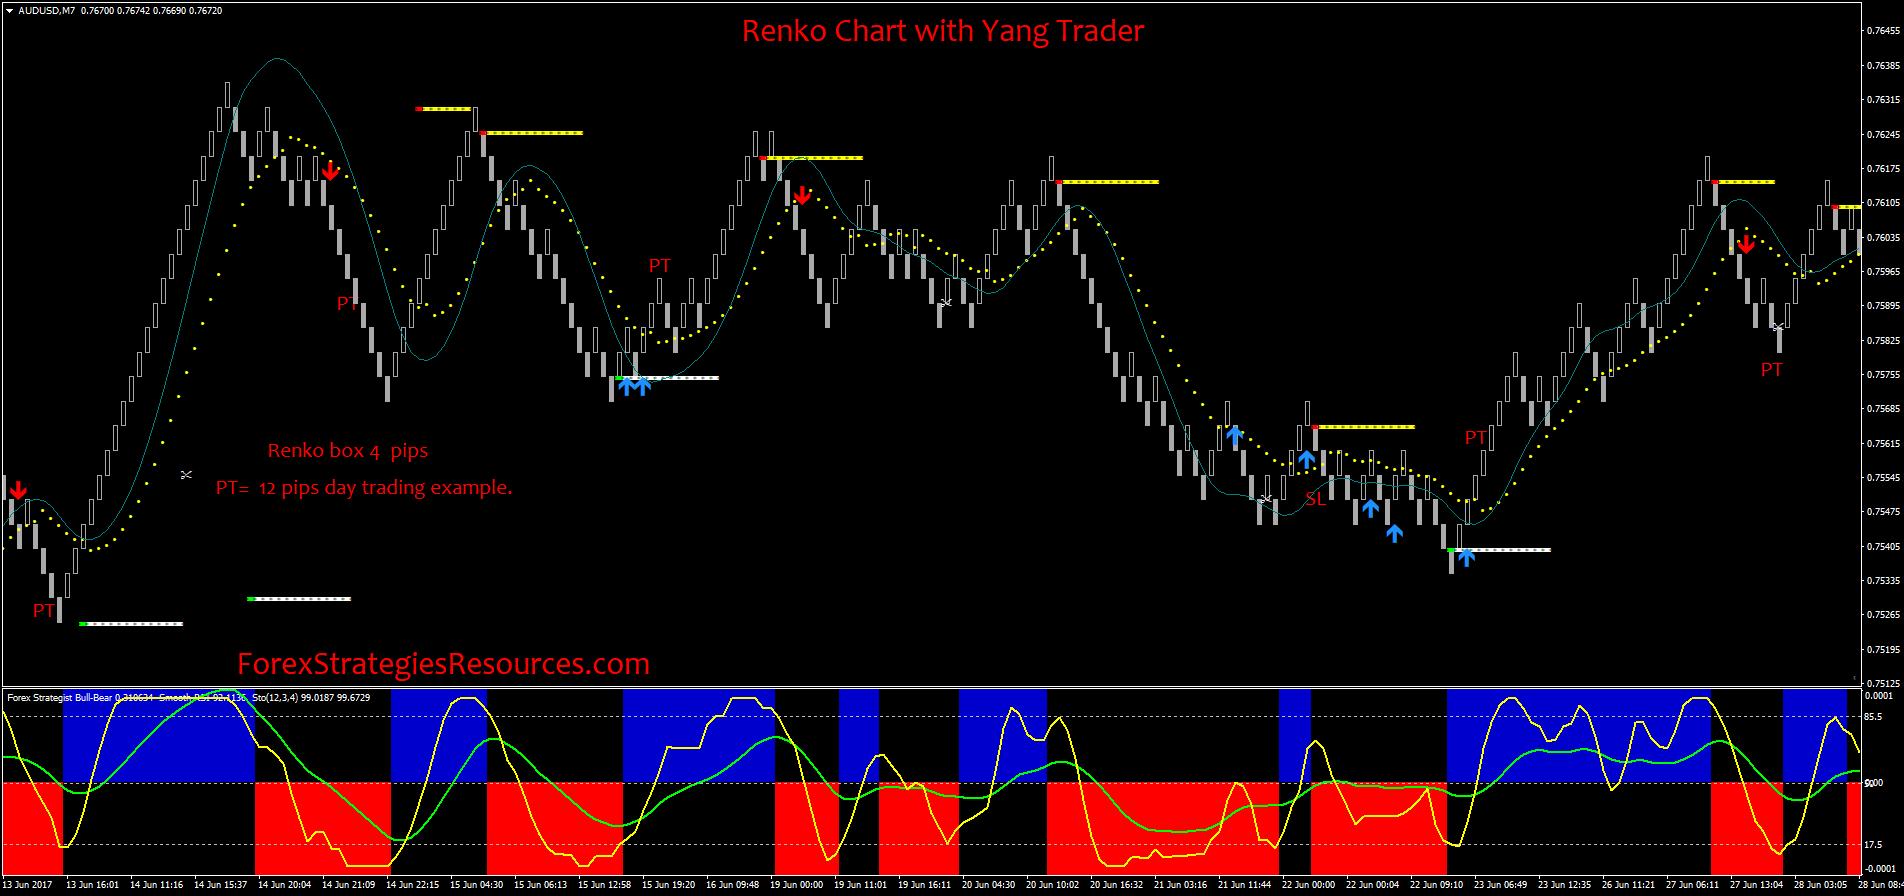 42# Renko Chart with Yang Trader - Forex Strategies - Forex